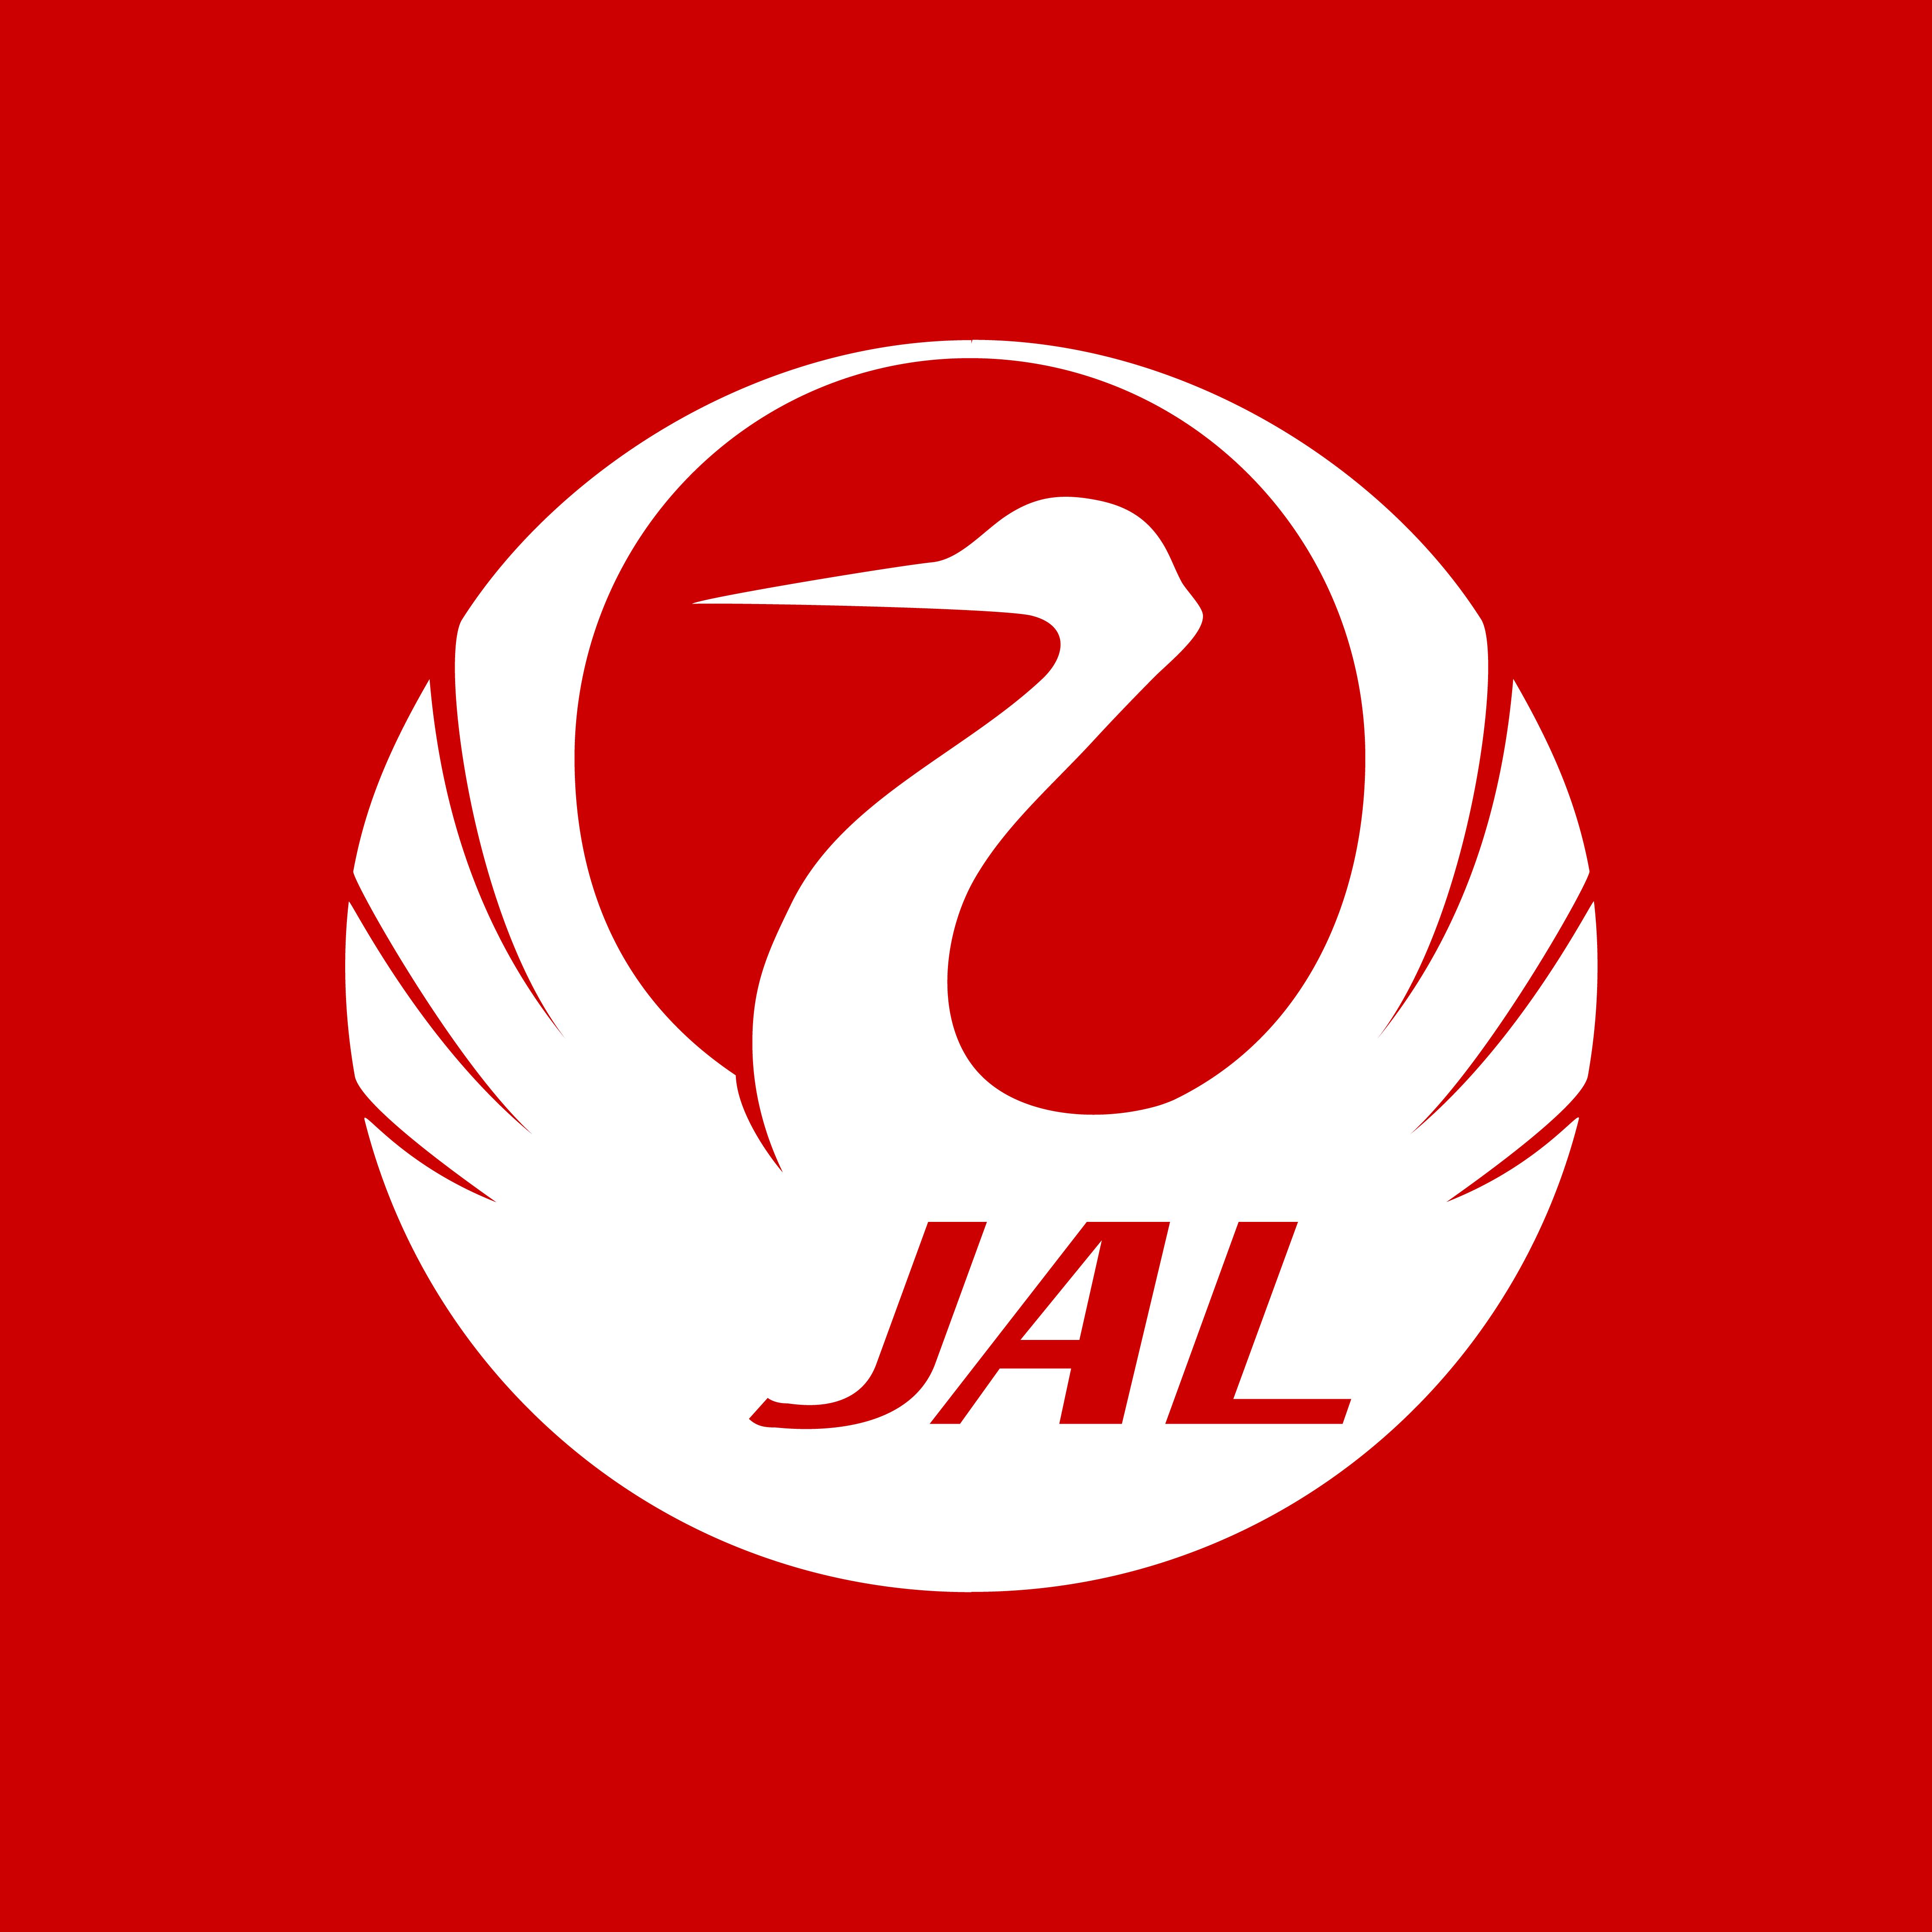 Japan Airlines JAL — Designer Jerry Huff Firm Botsford